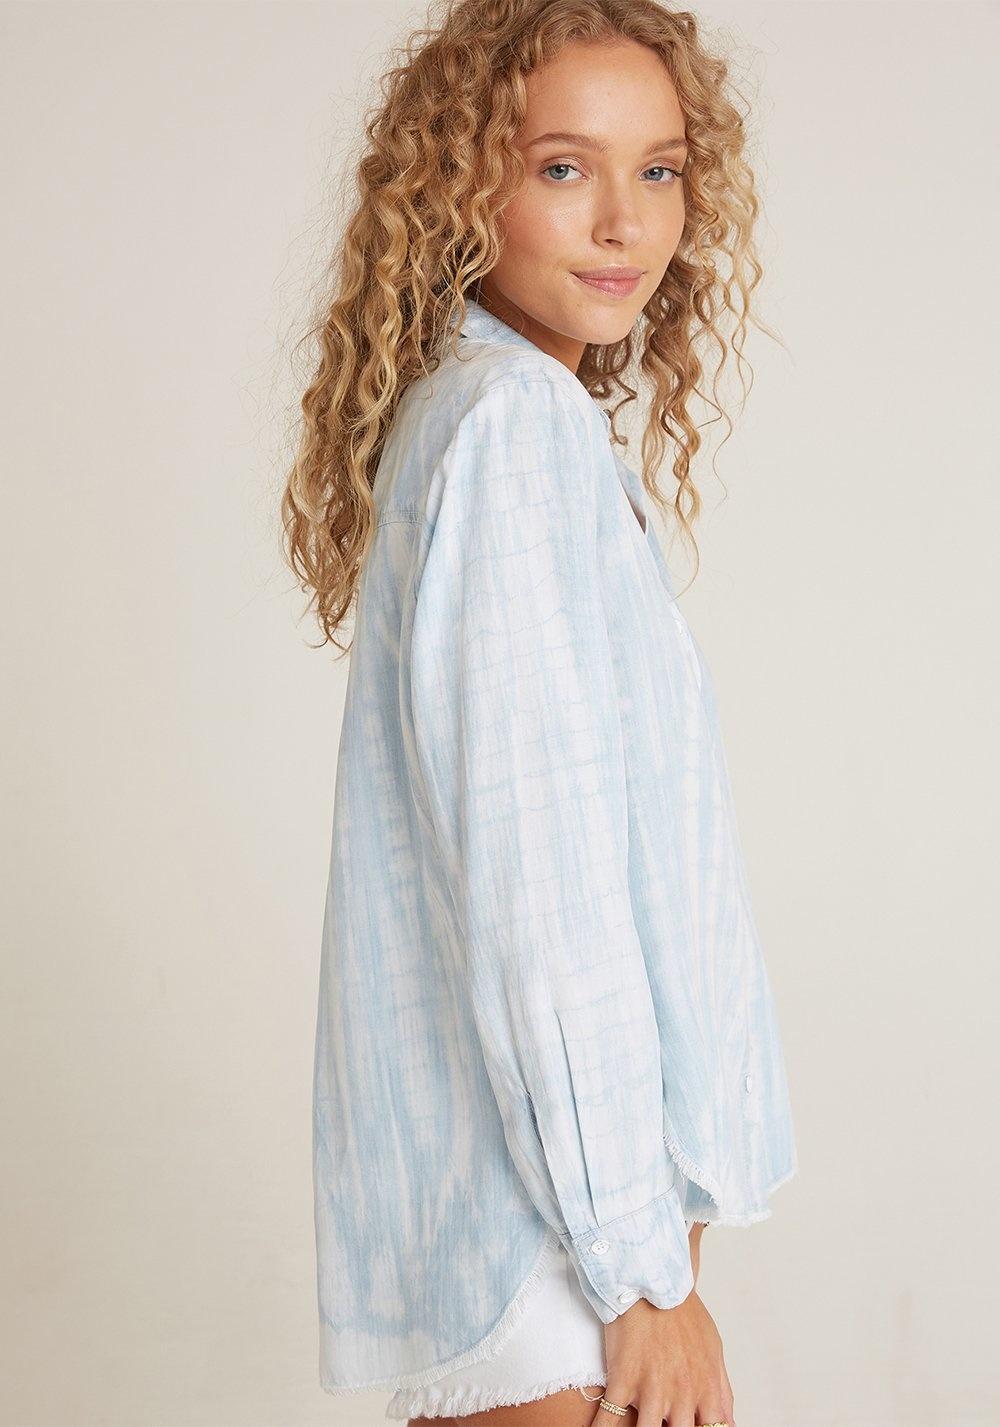 Bella Dahl Bella Dahl Fray Hem Flowy Shirt Havana Blue - Size M